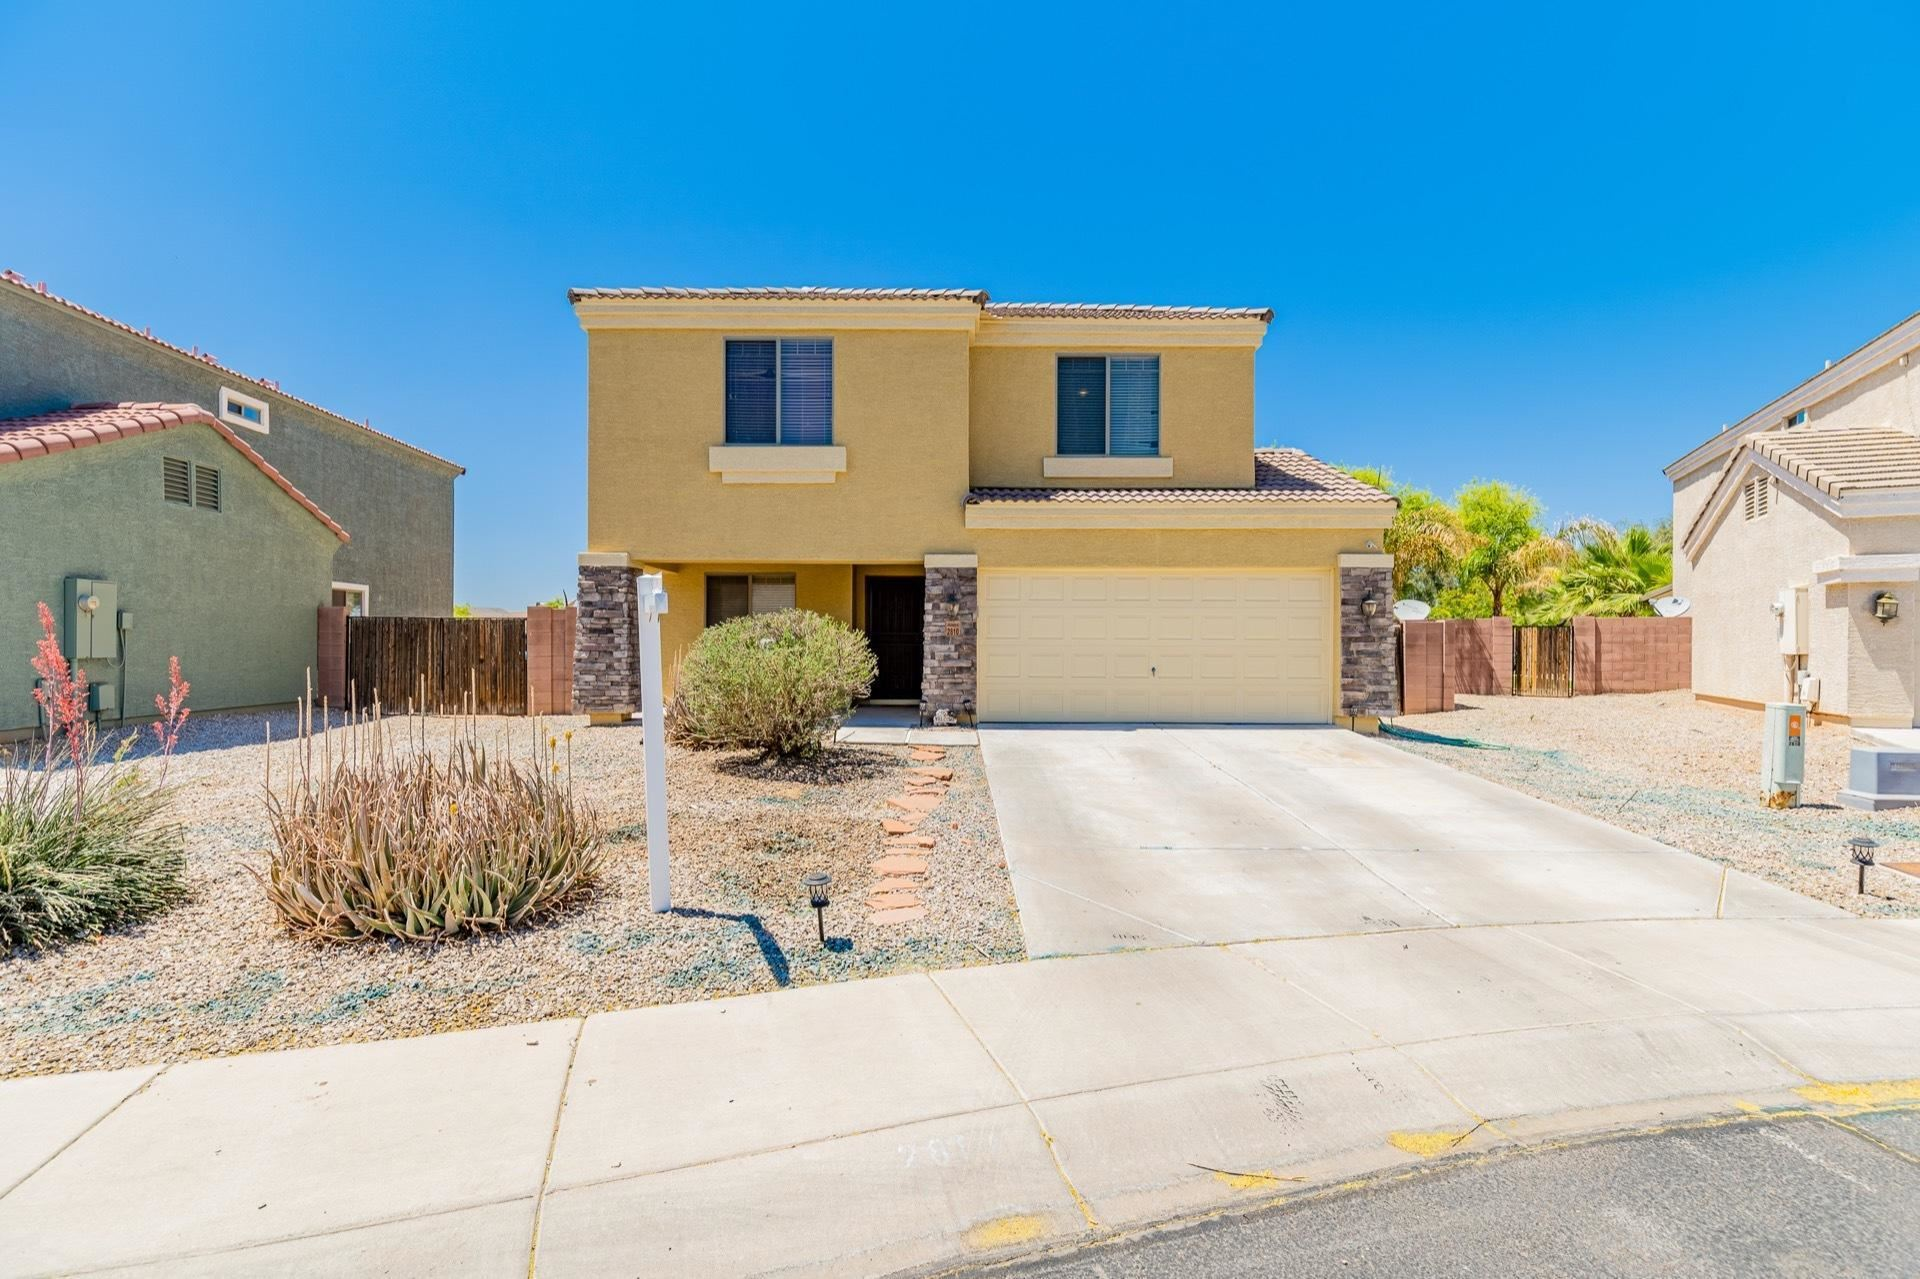 Photo of 2810 S 84TH Lane, Tolleson, AZ 85353 (MLS # 6232545)